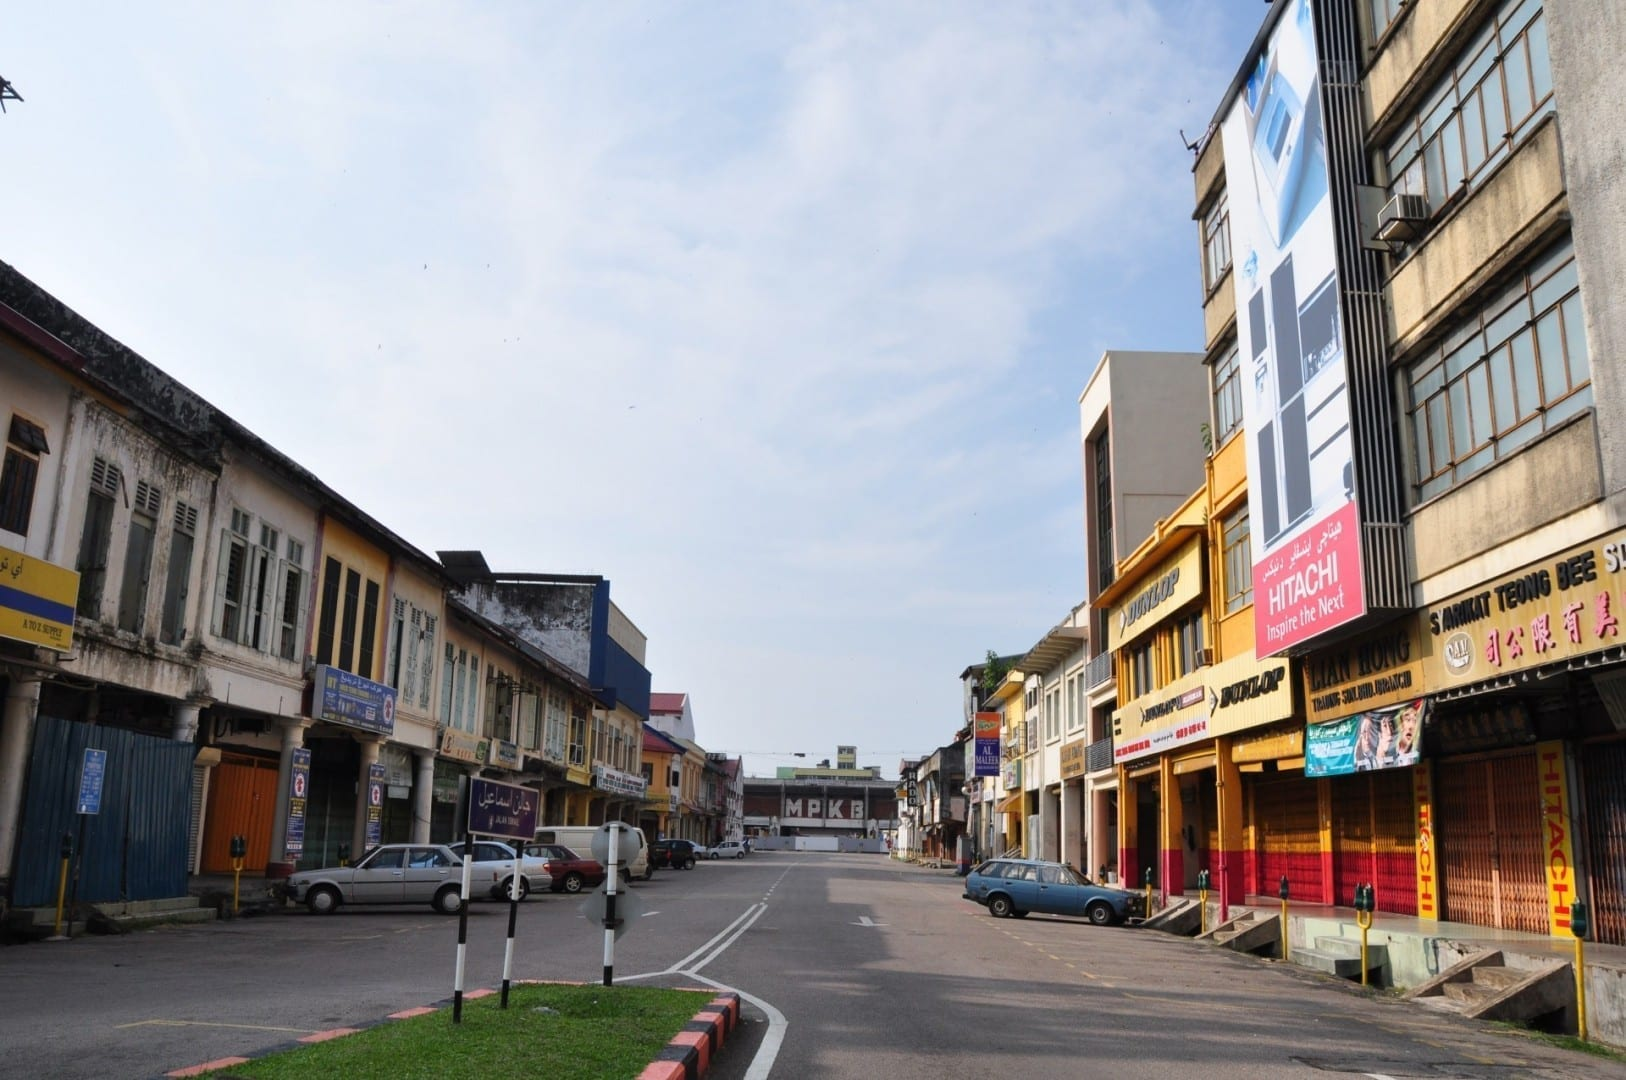 Kota Bharu Kota Bharu Malasia